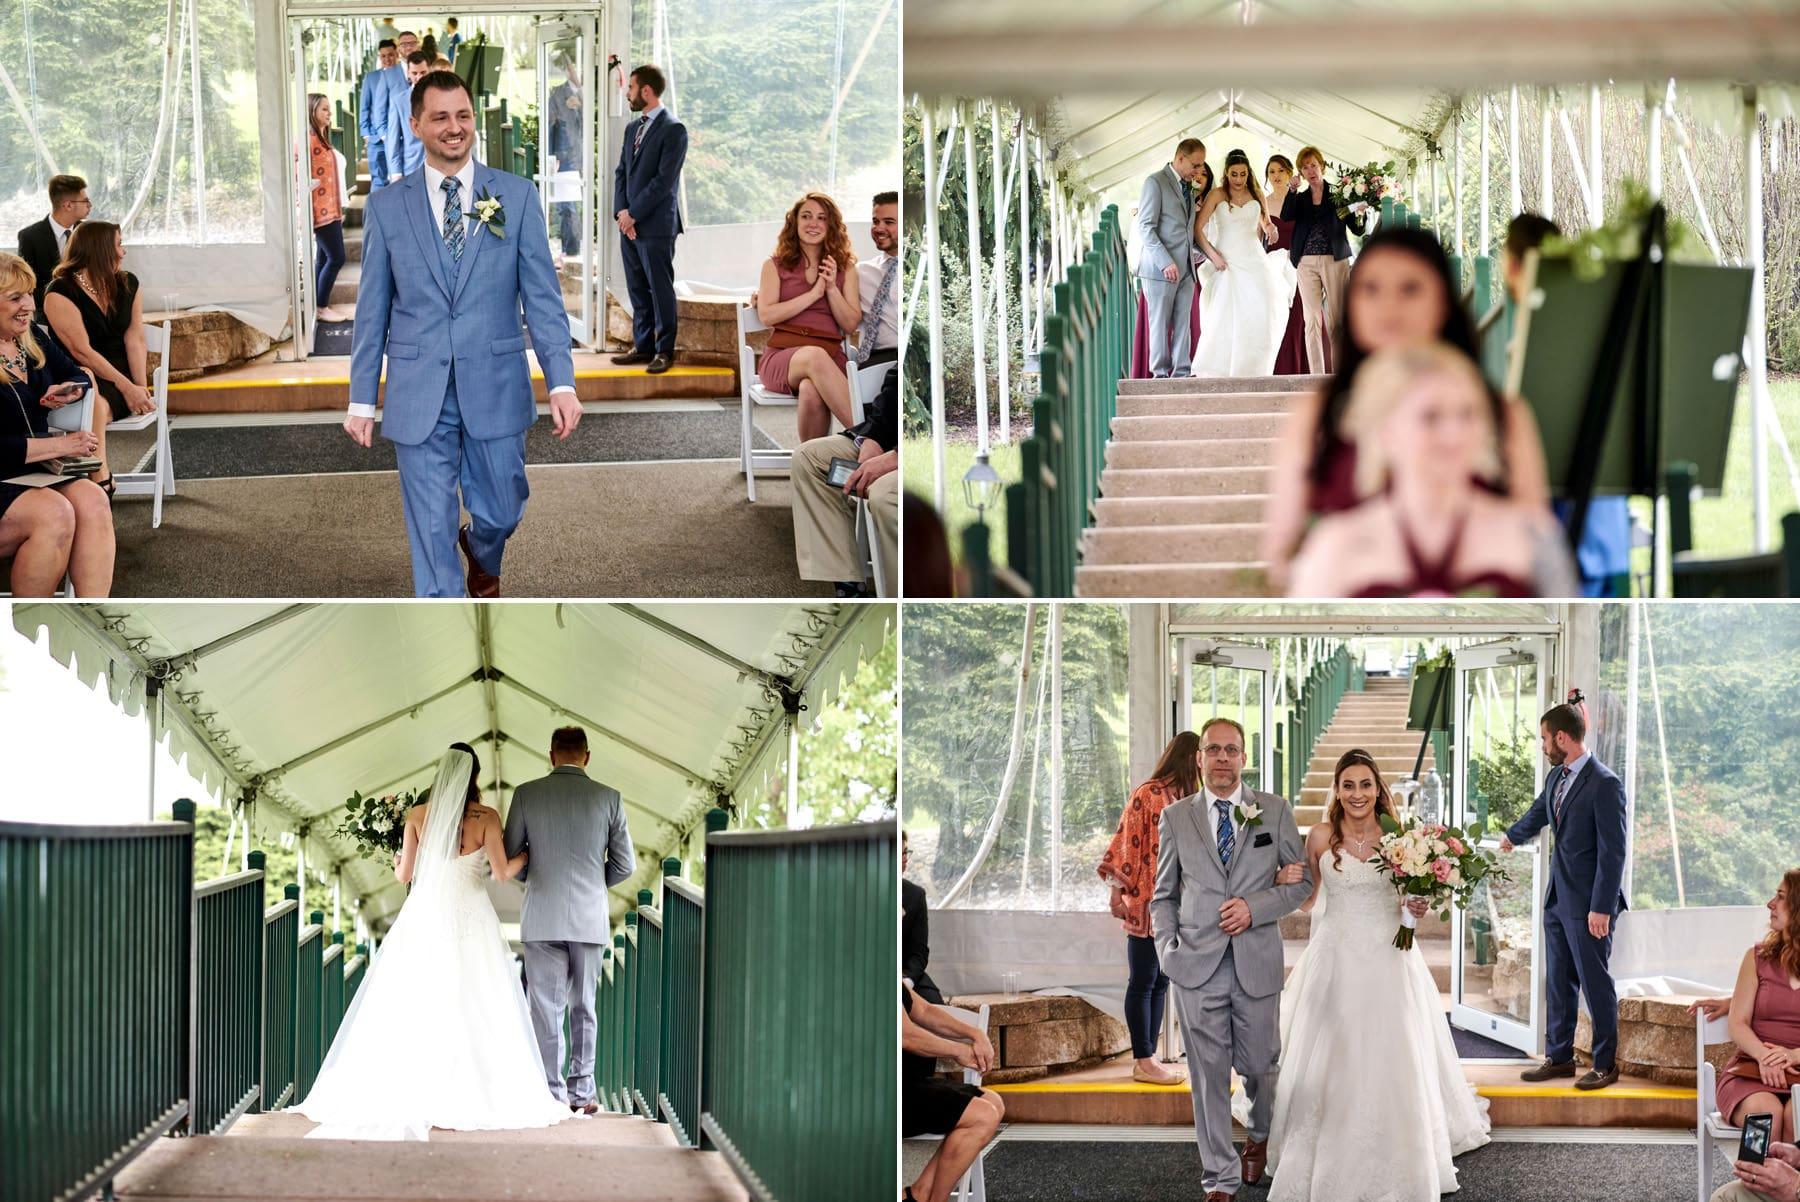 basking ridge country club wedding tent ceremony